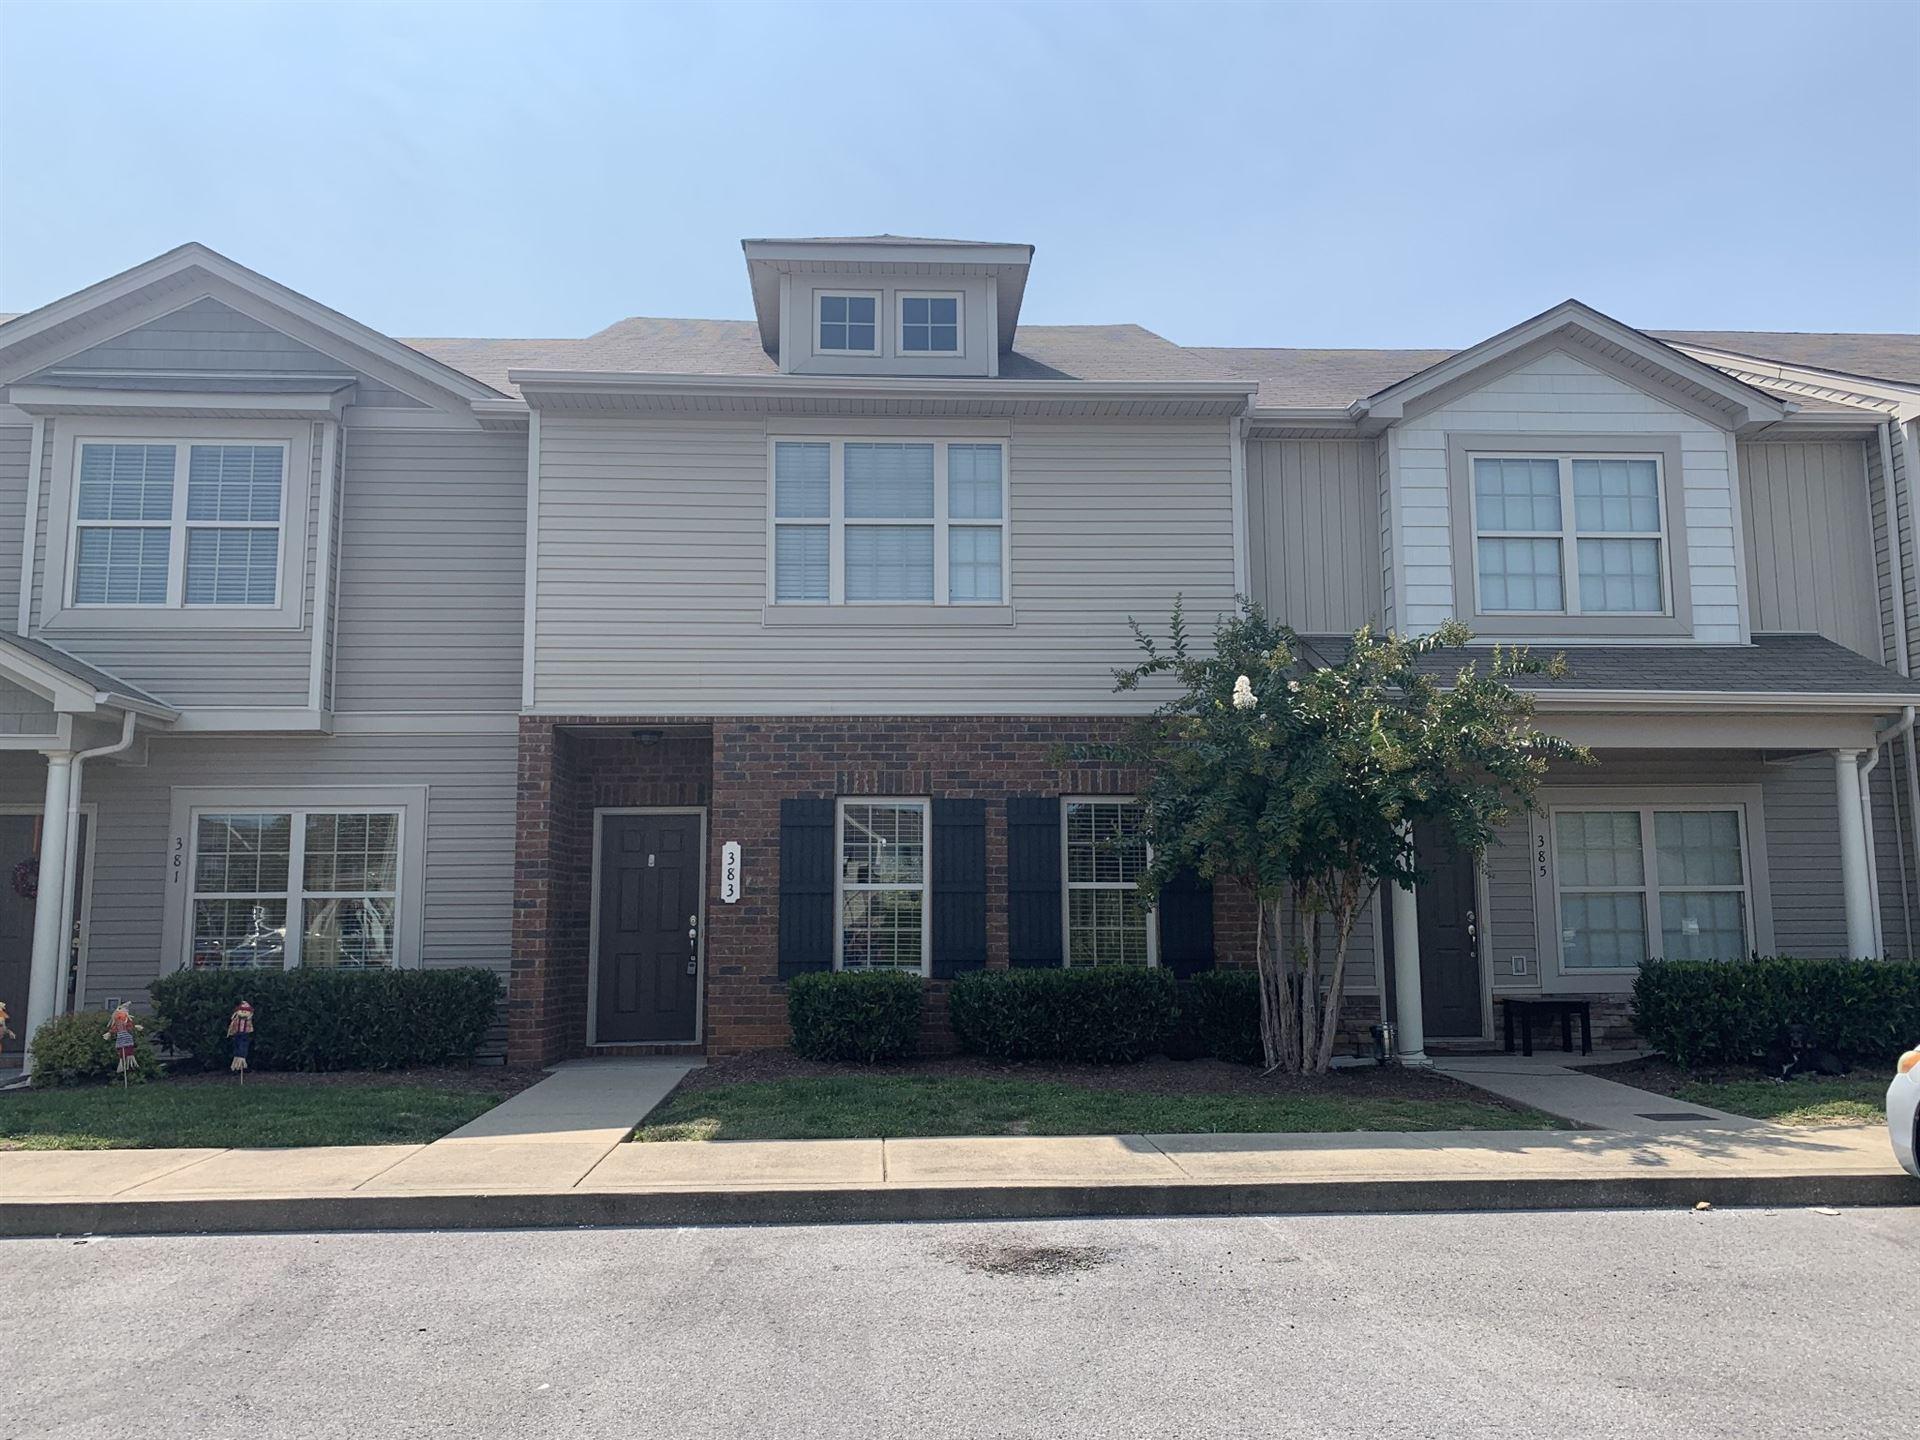 Photo of 383 Brooklet Ct, Murfreesboro, TN 37128 (MLS # 2290270)